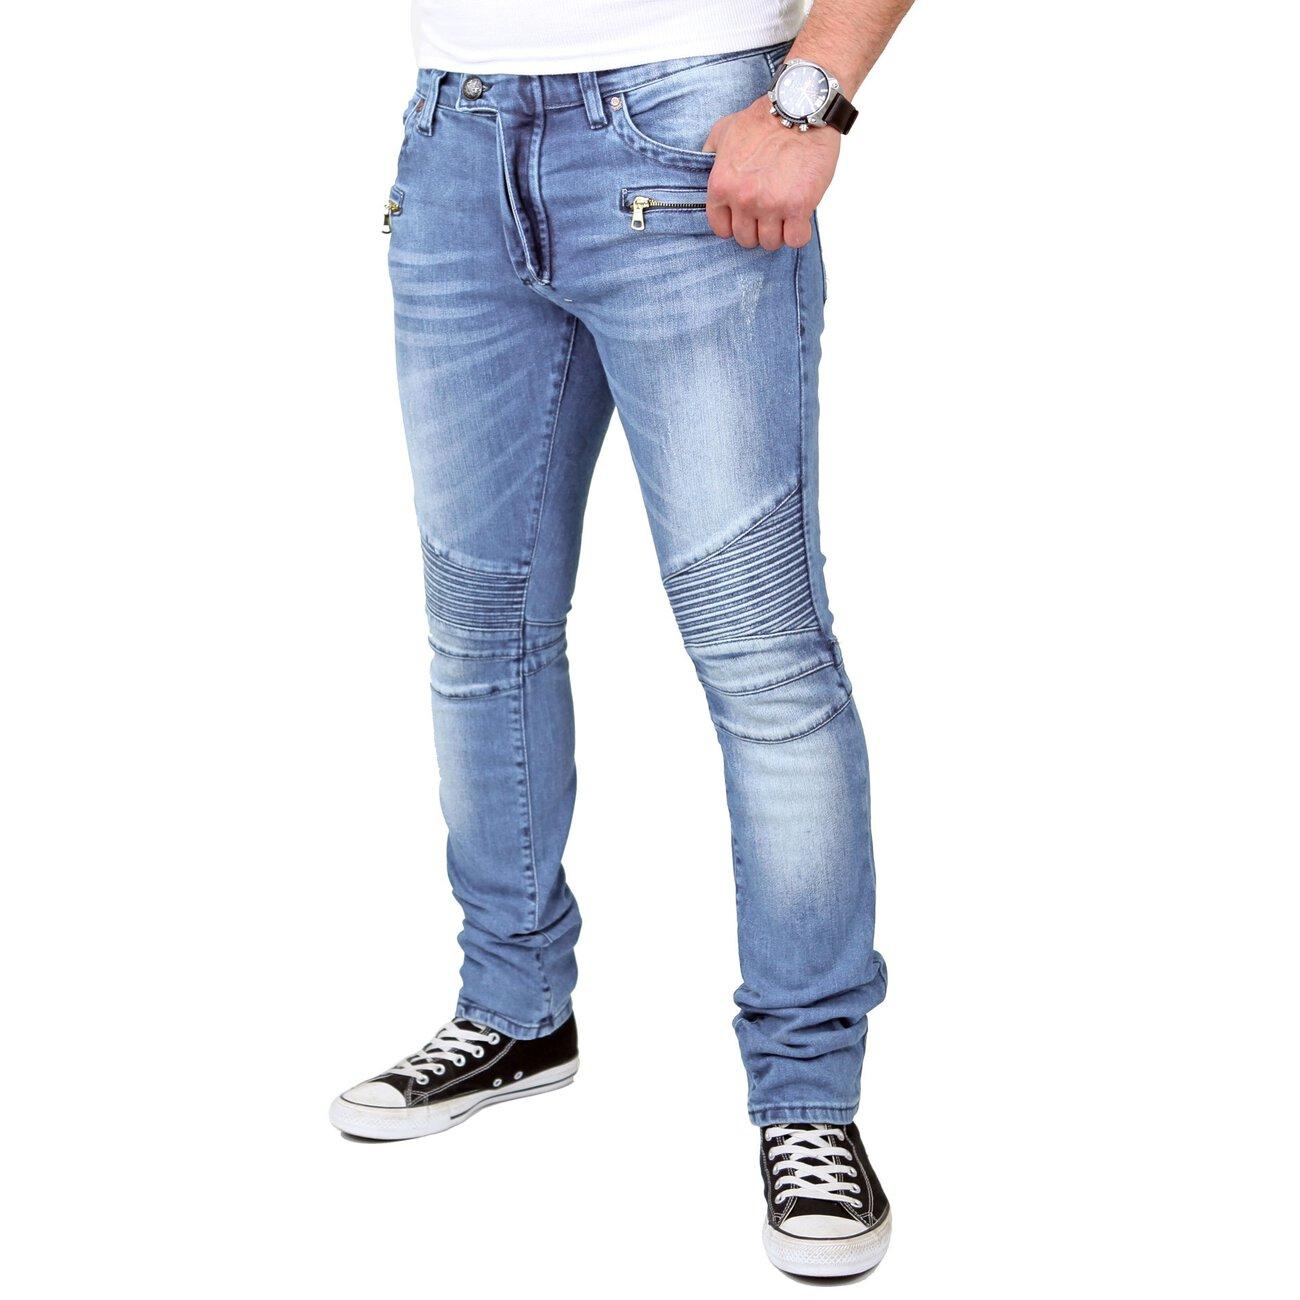 reslad jeans herren skinny used look jeanshose rs 1166 hellblau w31. Black Bedroom Furniture Sets. Home Design Ideas